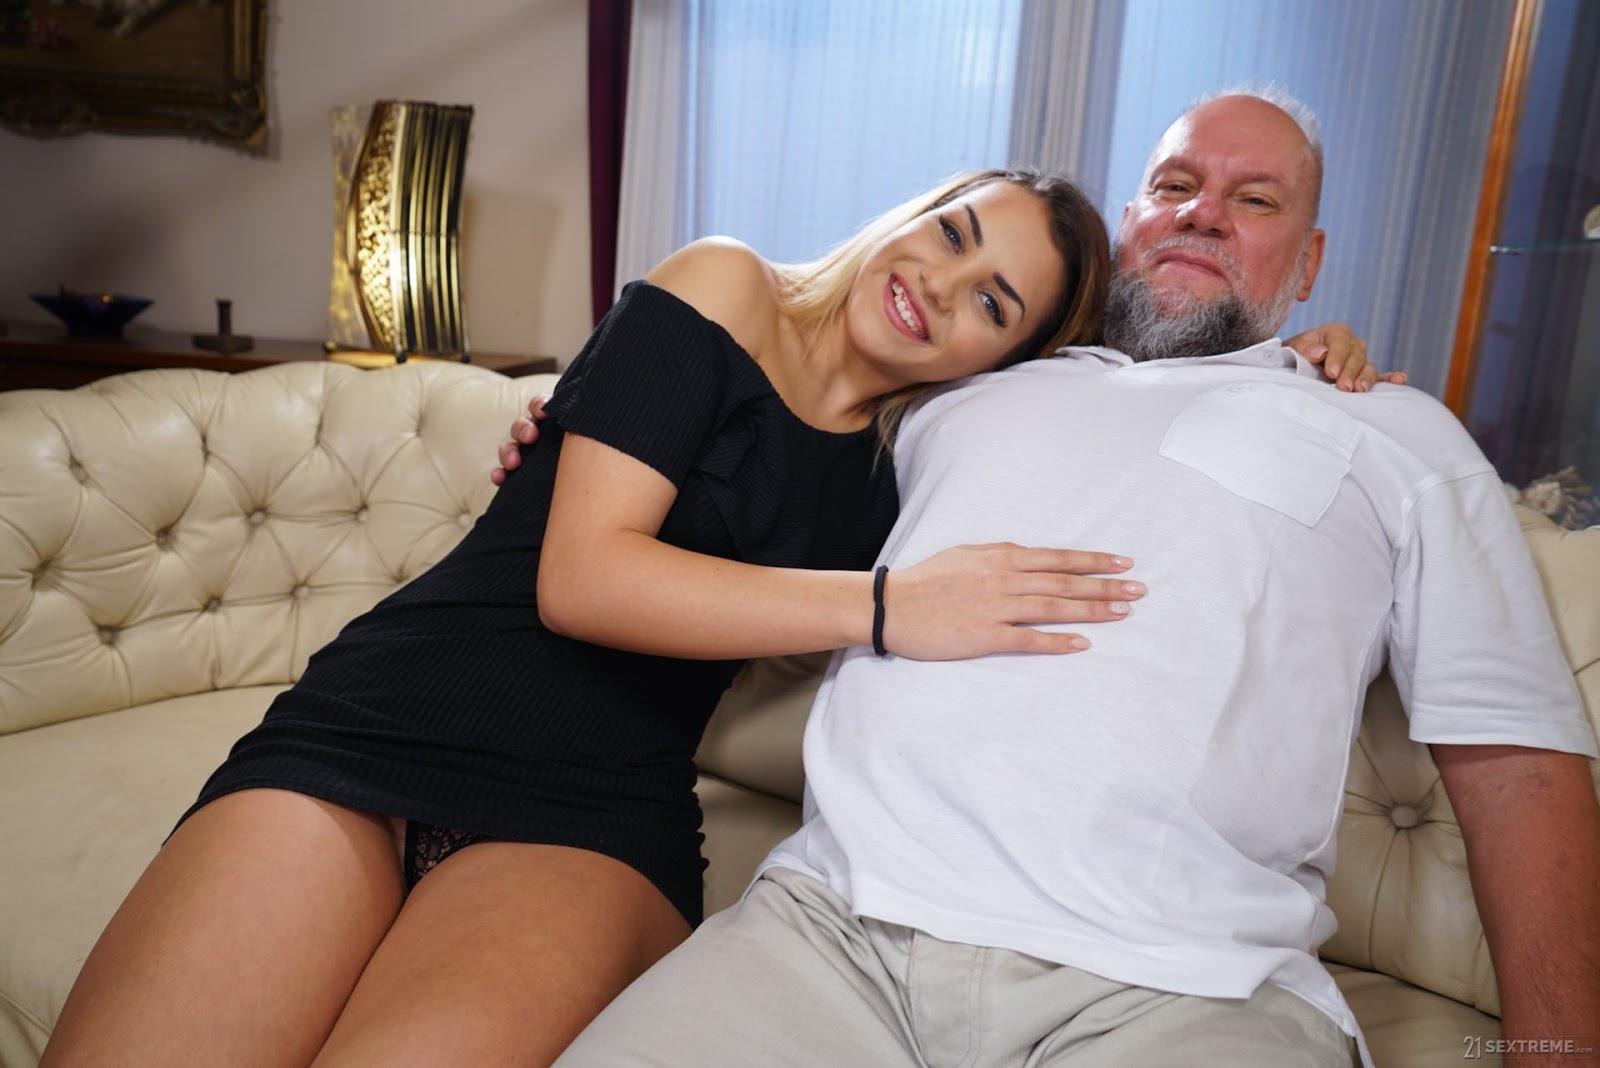 Not Like That,21 SEXTREME, 4K, Anal, Threesome, Uncensored, Westen, Westen Porn,Albert, Bianca Booty